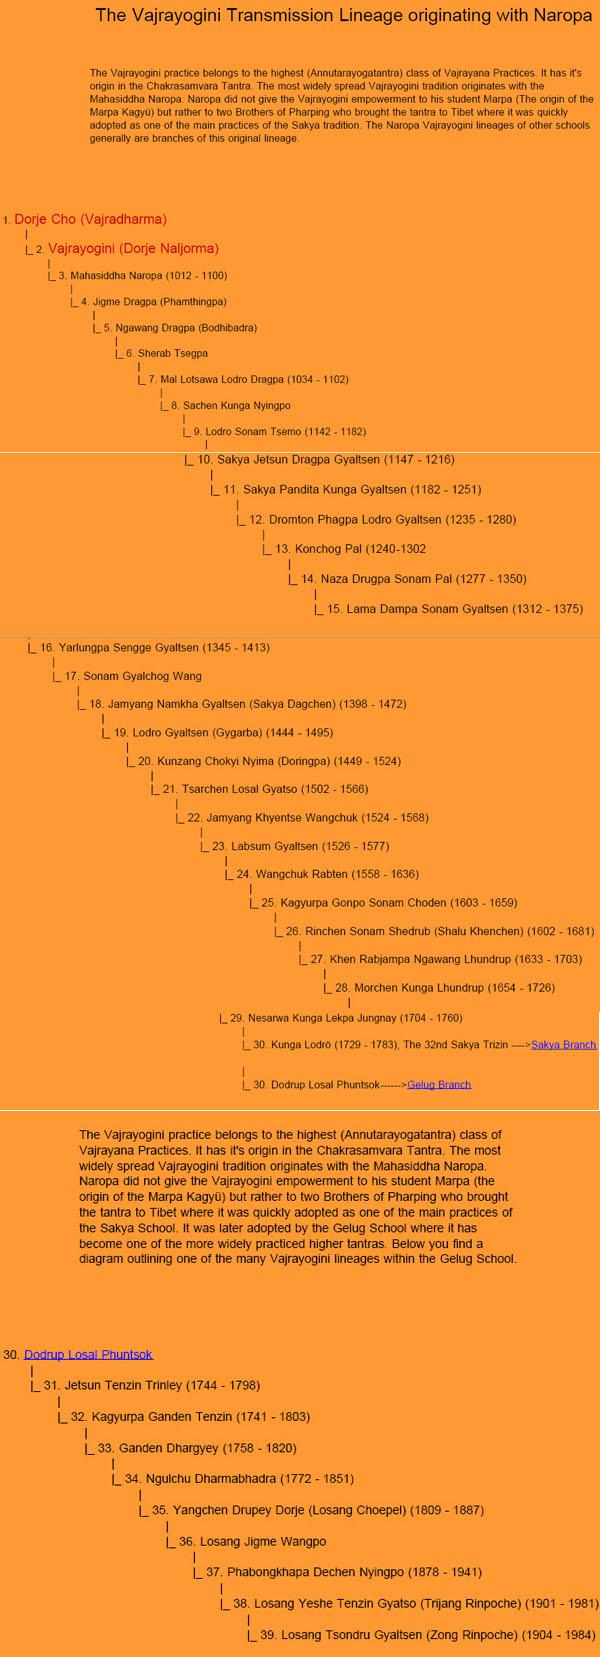 The Vajrayogini Transmission Lineage originating from Naropa